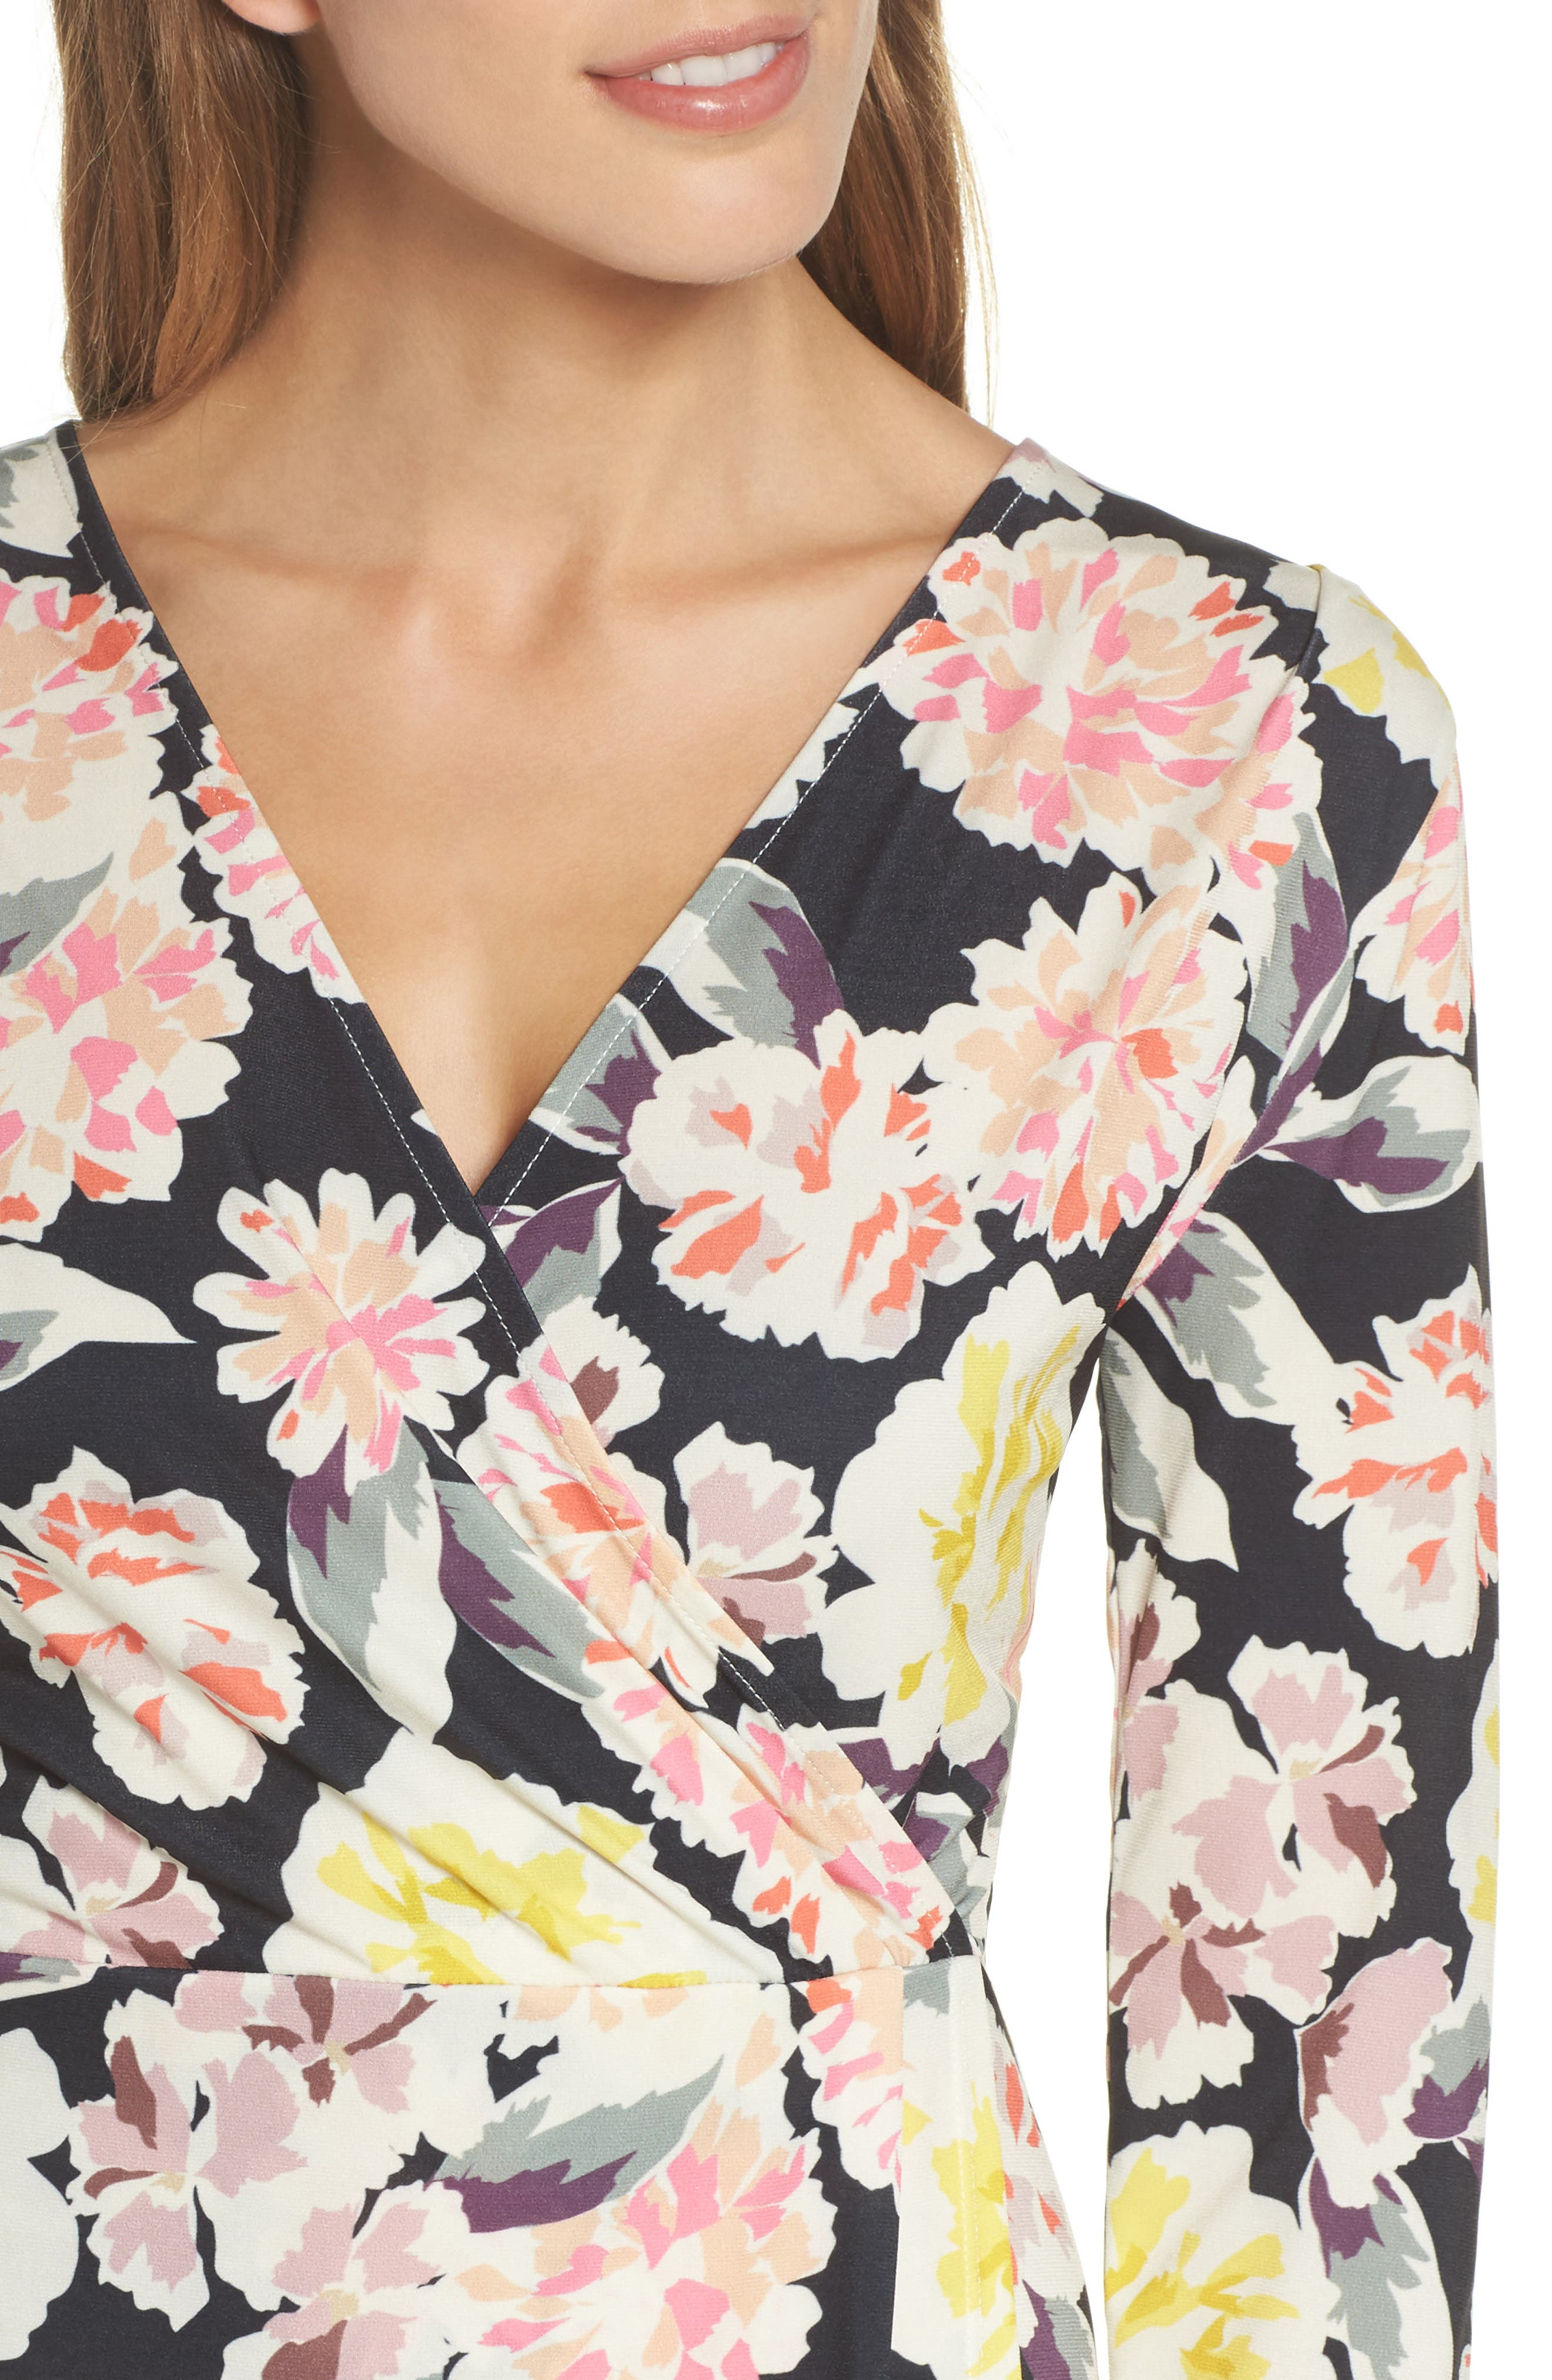 Enoshima Sheath Dress,                             Alternate thumbnail 4, color,                             004